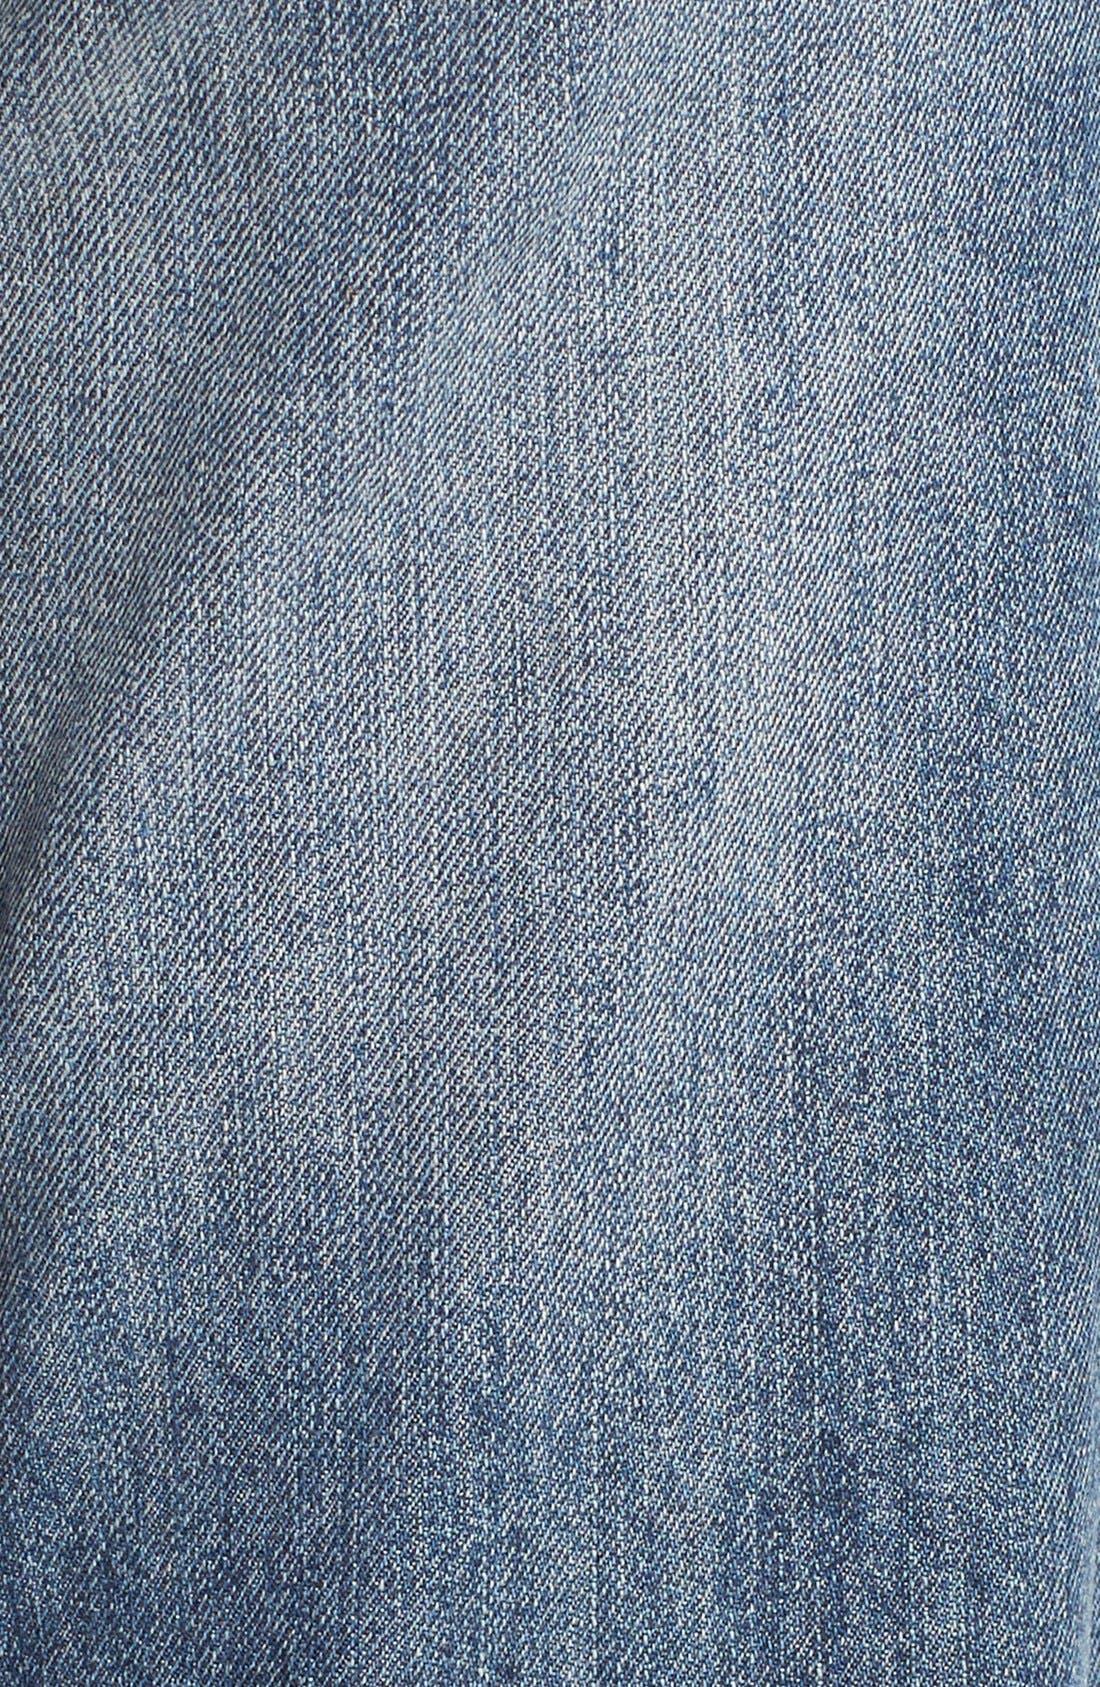 Alternate Image 5  - Generra Distressed Slim Boyfriend Jeans (Carren)